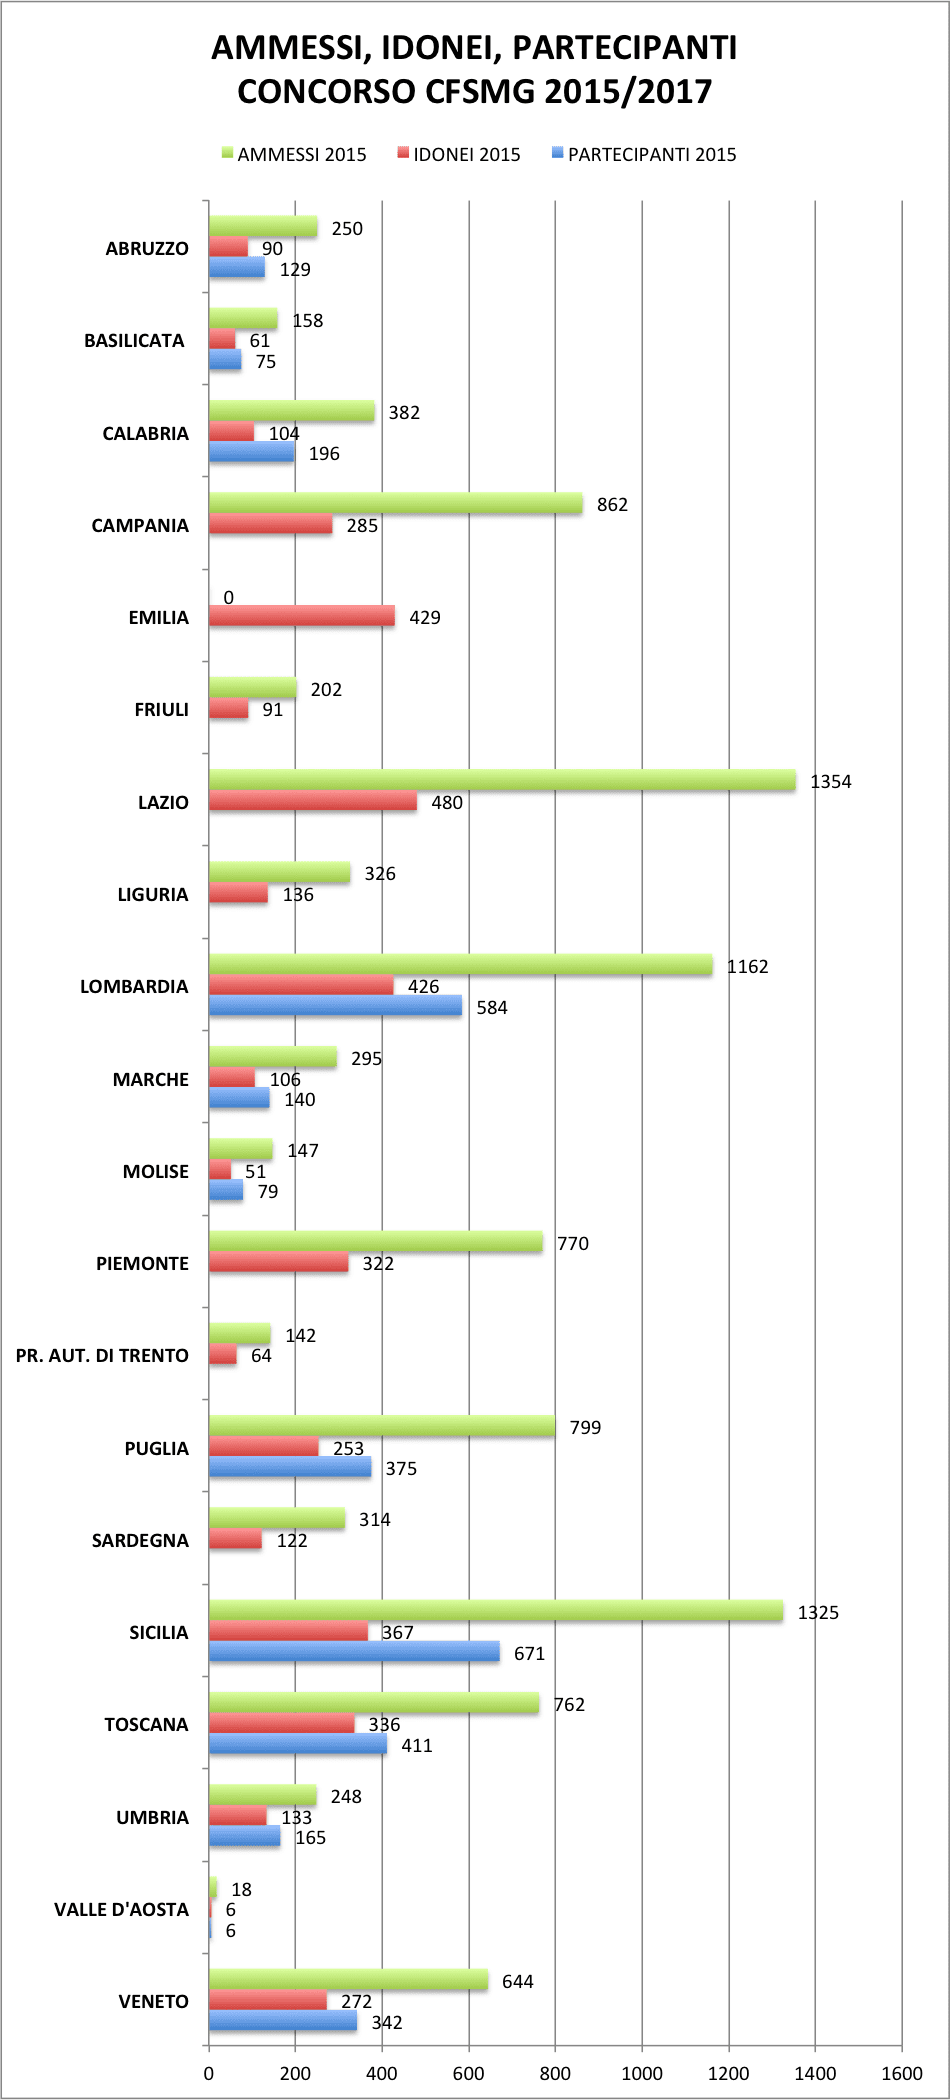 AMMESSI, IDONEI, PARTECIPANTI 2015